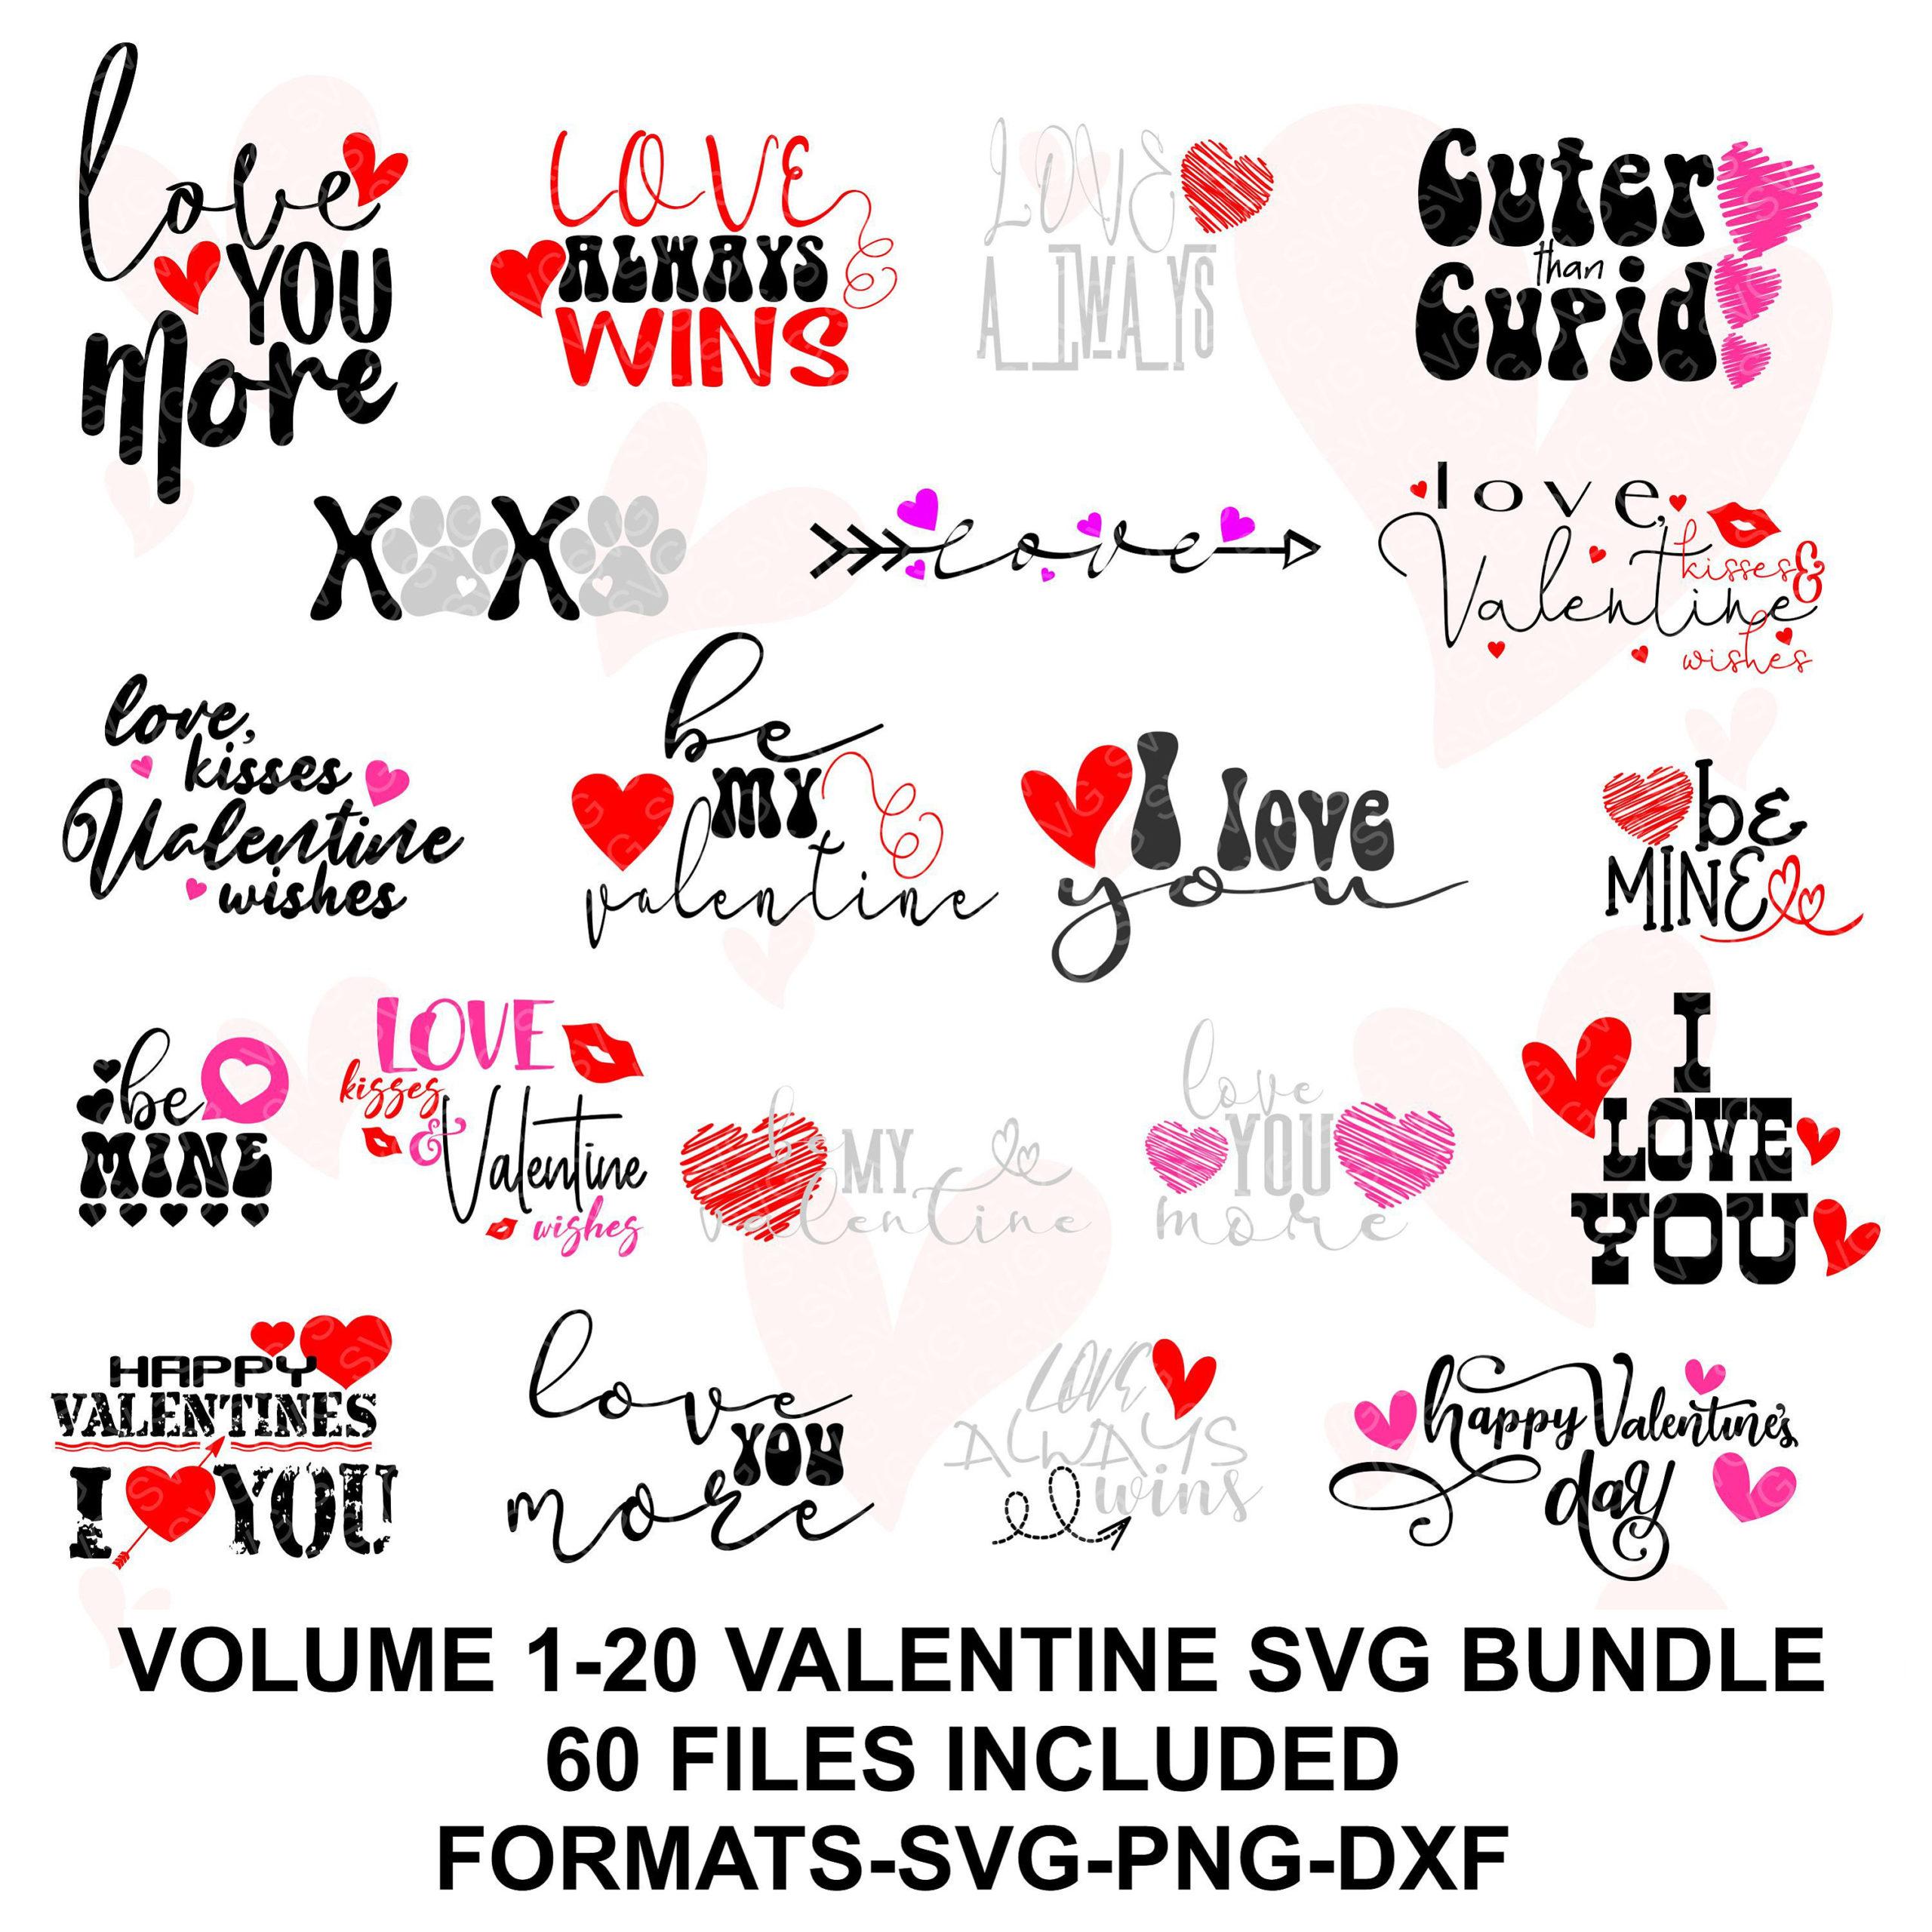 20-valentine-design-bundle-svg-bundle-svg-valentine-svg-valentine-bundle-svg-valentine-svg-designs-valentine-cut-files-cricut-svg-600a11d7